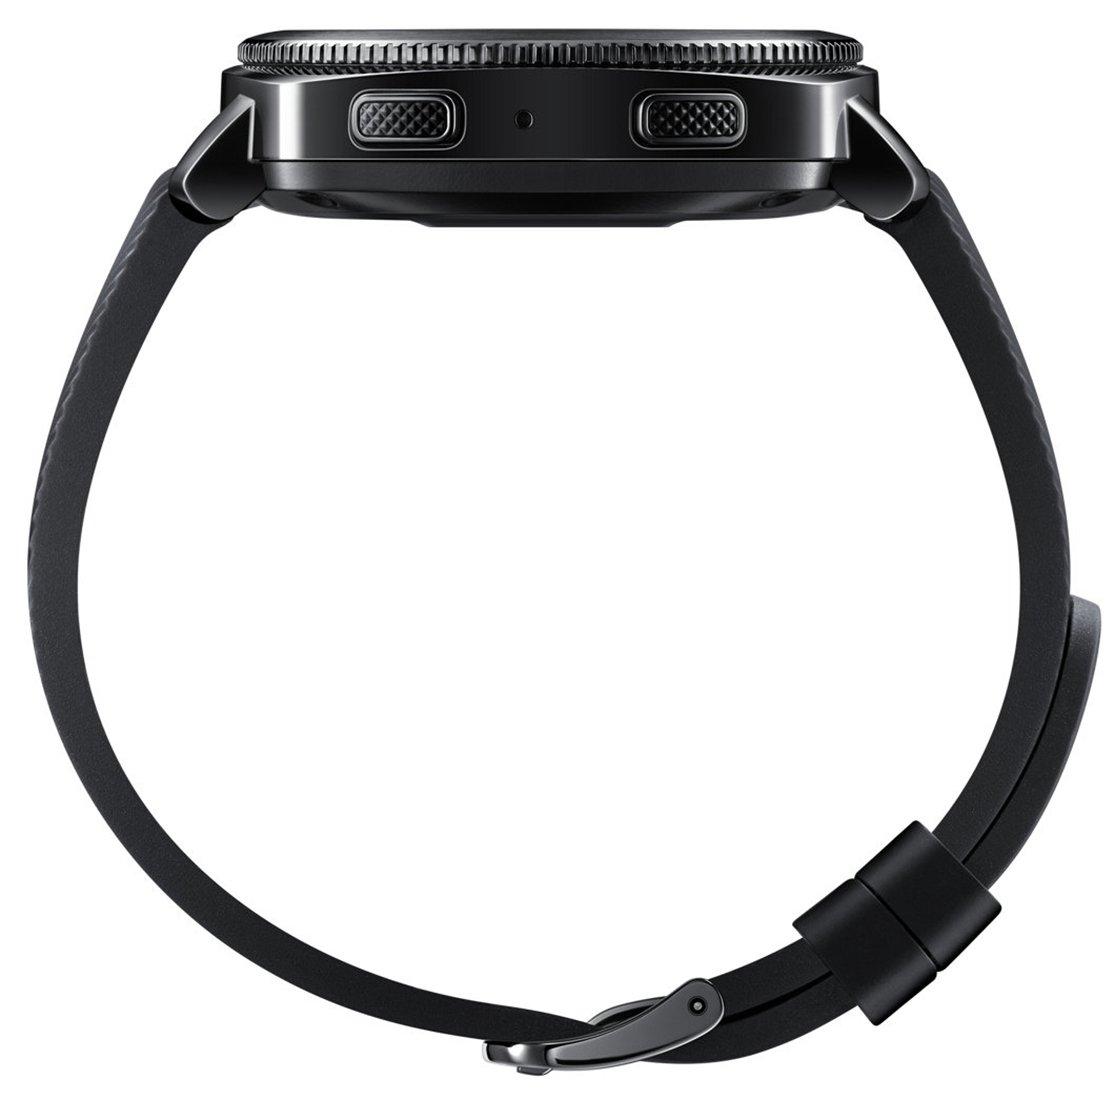 Samsung Gear Sport Smartwatch Fitness Tracker- Water Resistant - International Version- No Warranty- Black (SM-R600NZKATTT) by Samsung (Image #6)